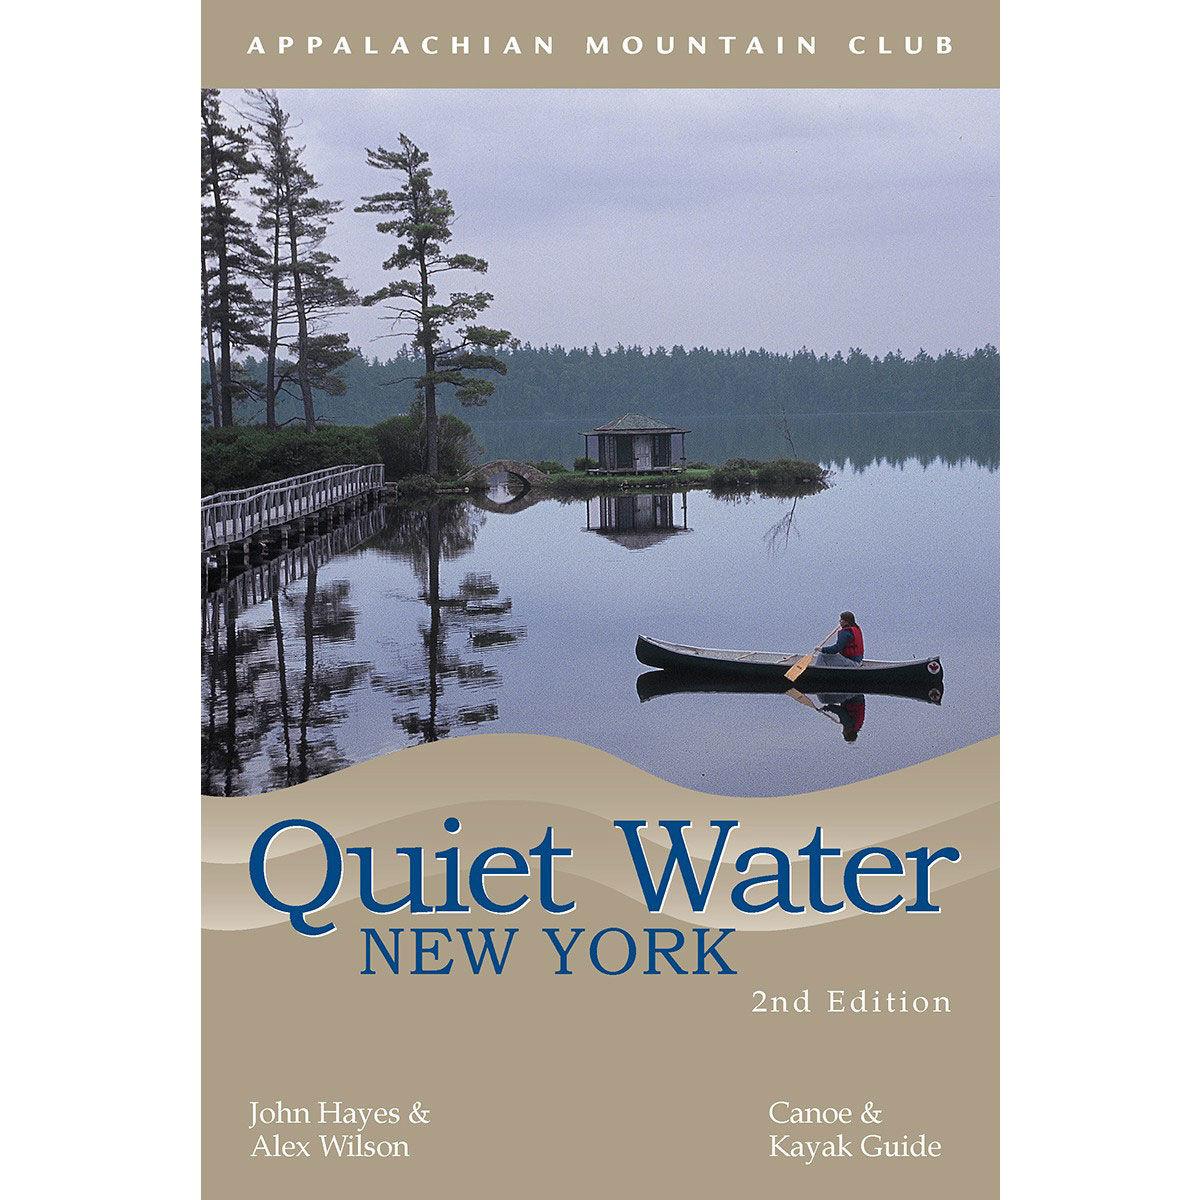 Appalachian Mountain Club Quiet Water New York